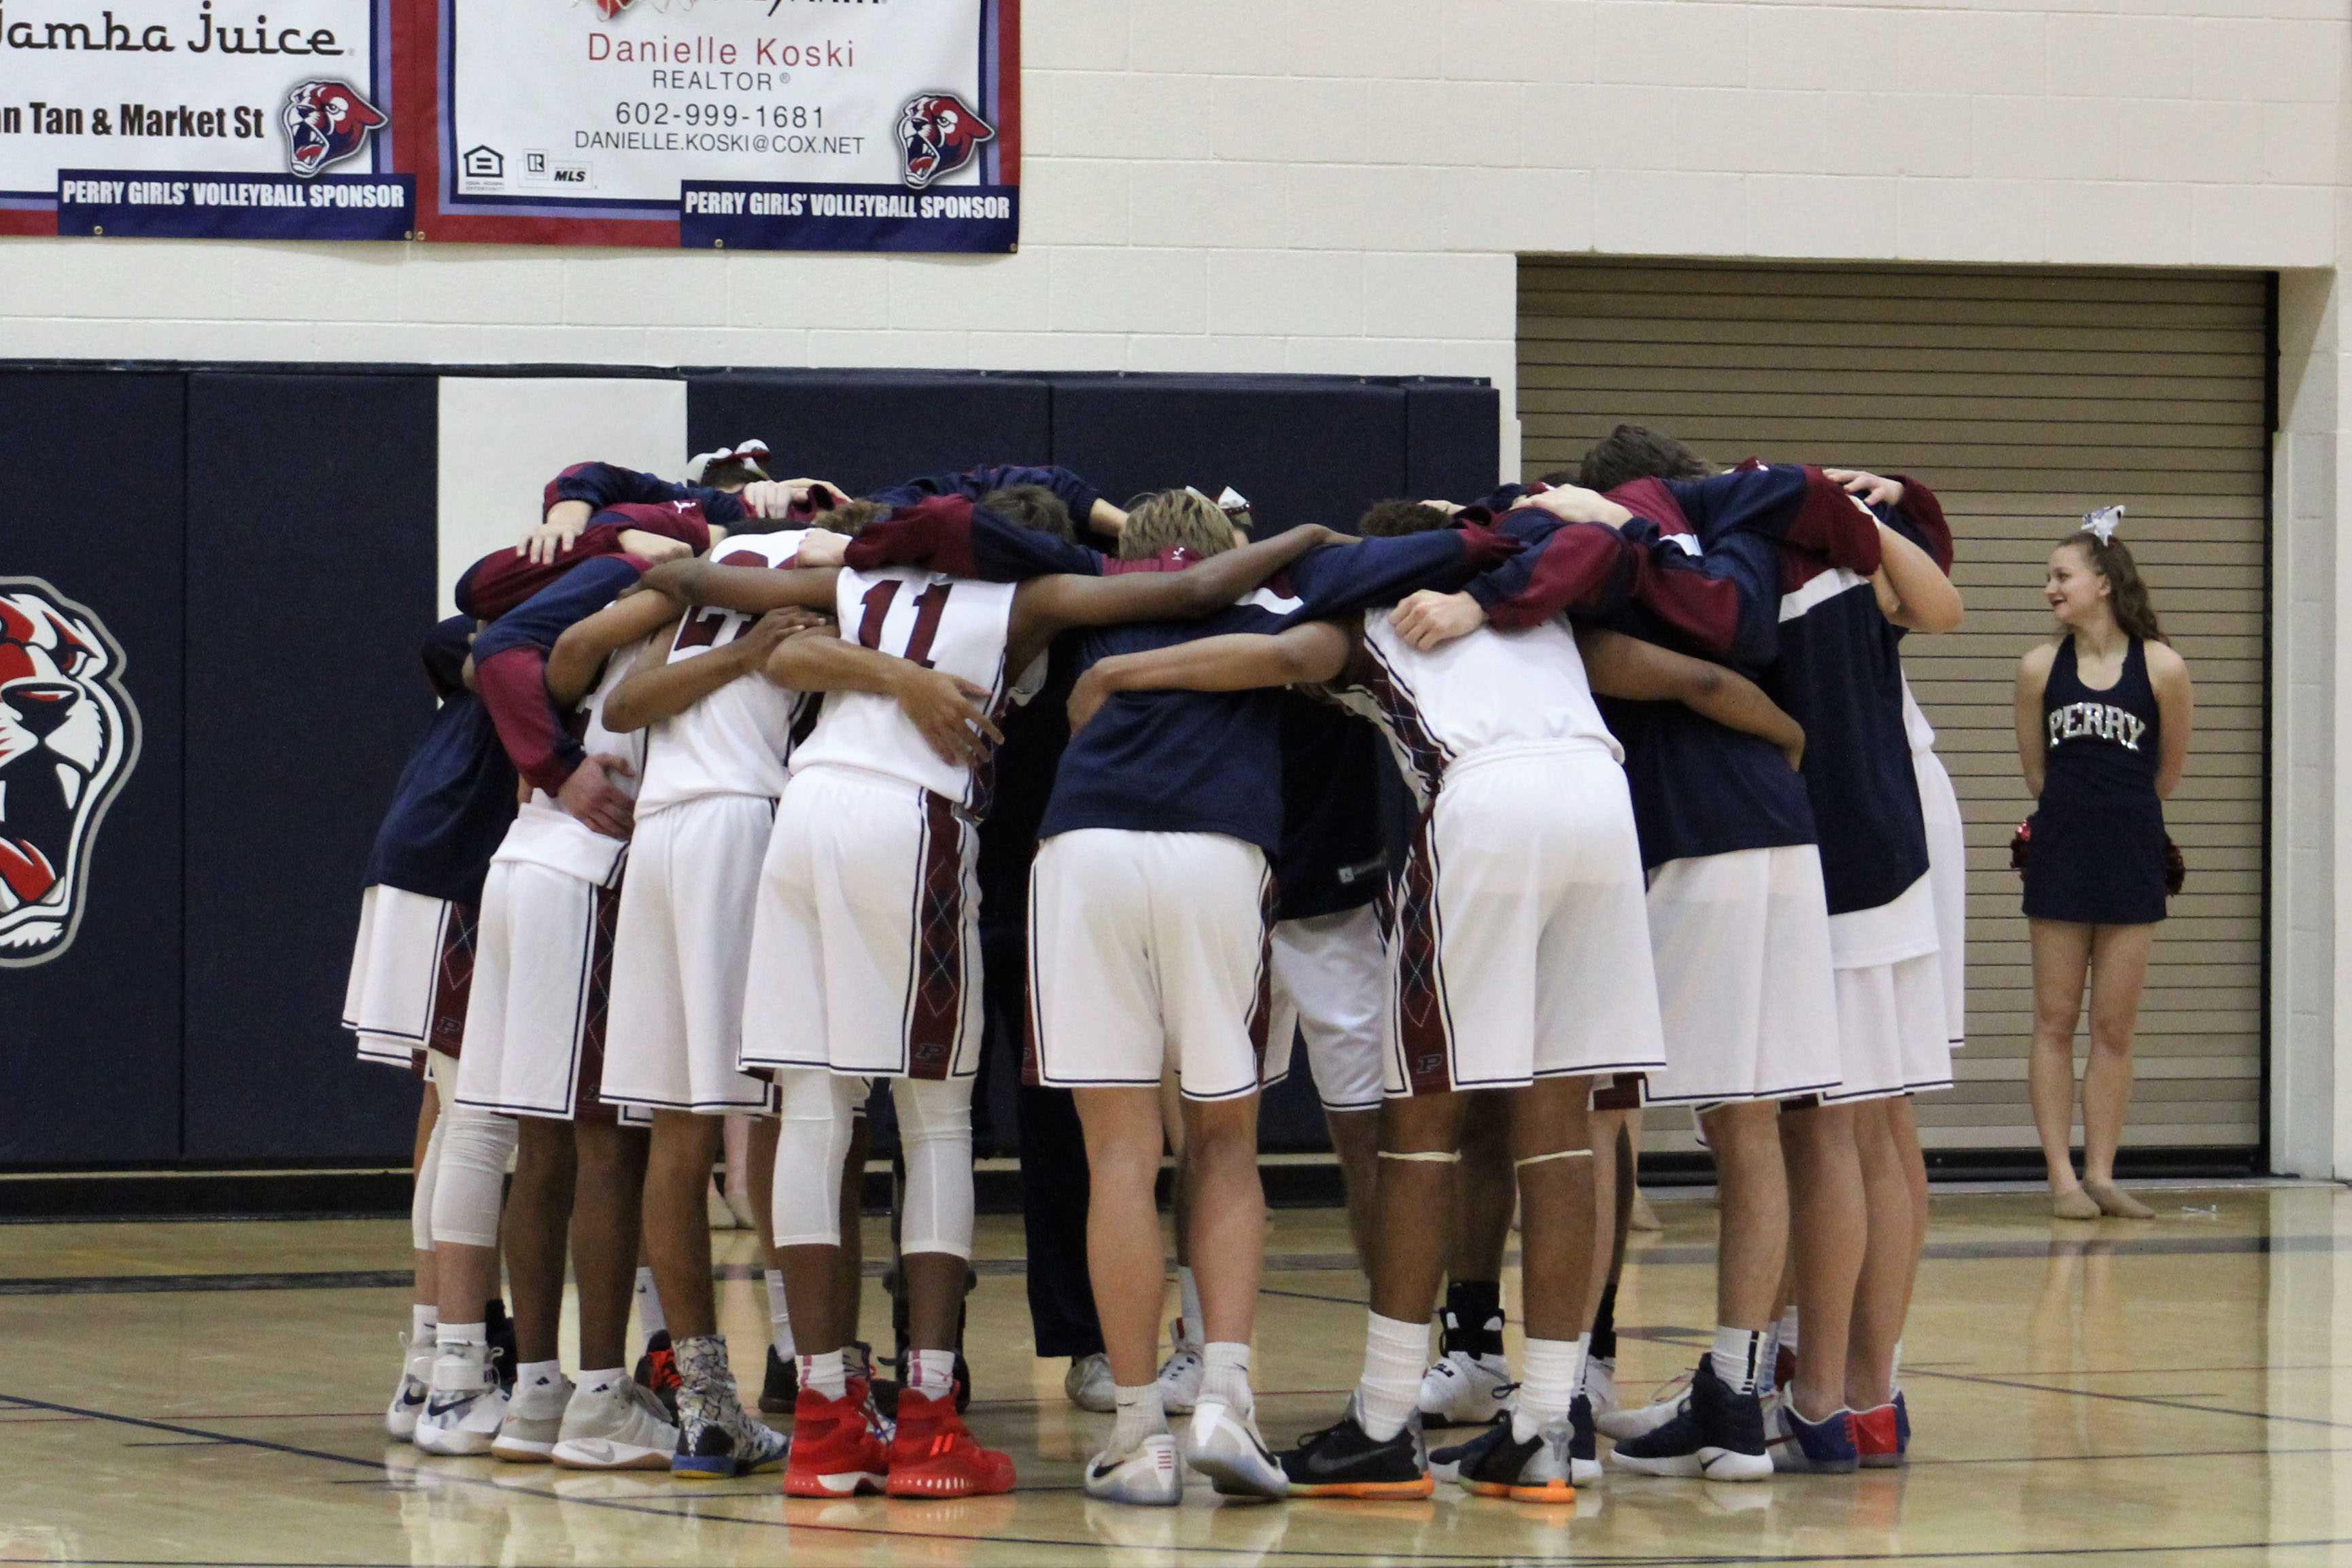 Boys basketball team huddles during game.